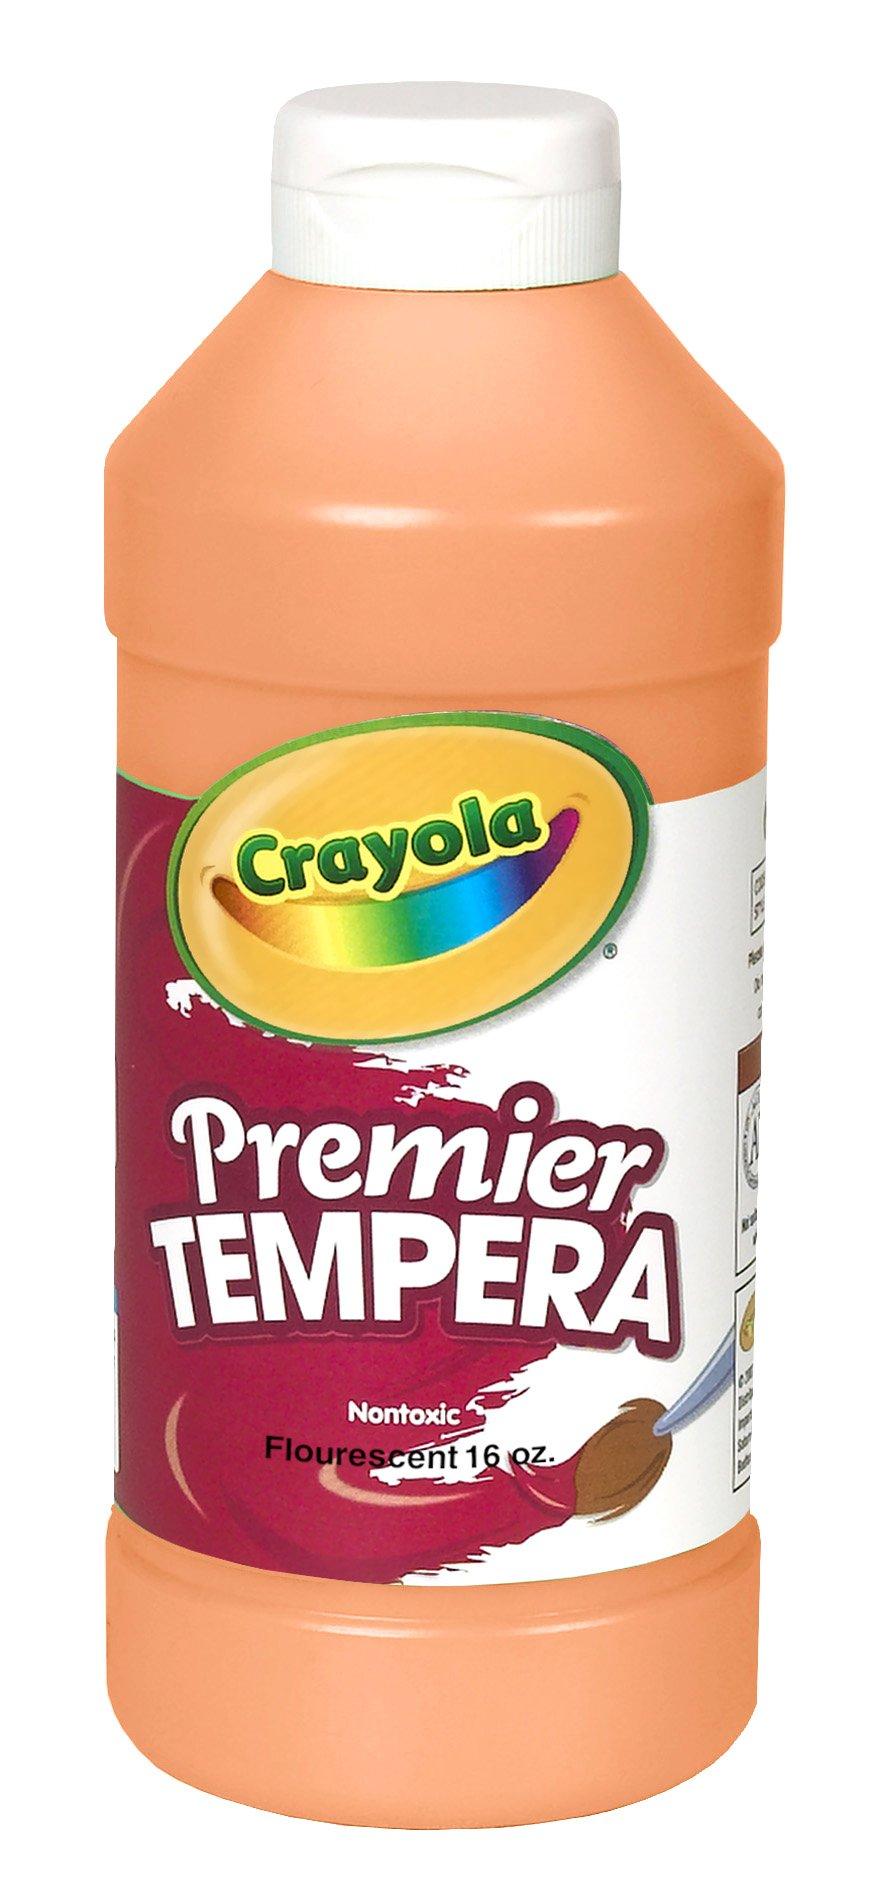 Crayola Tempera Paint, Fluorescent Orange, 16 Ounces, Kids Paint